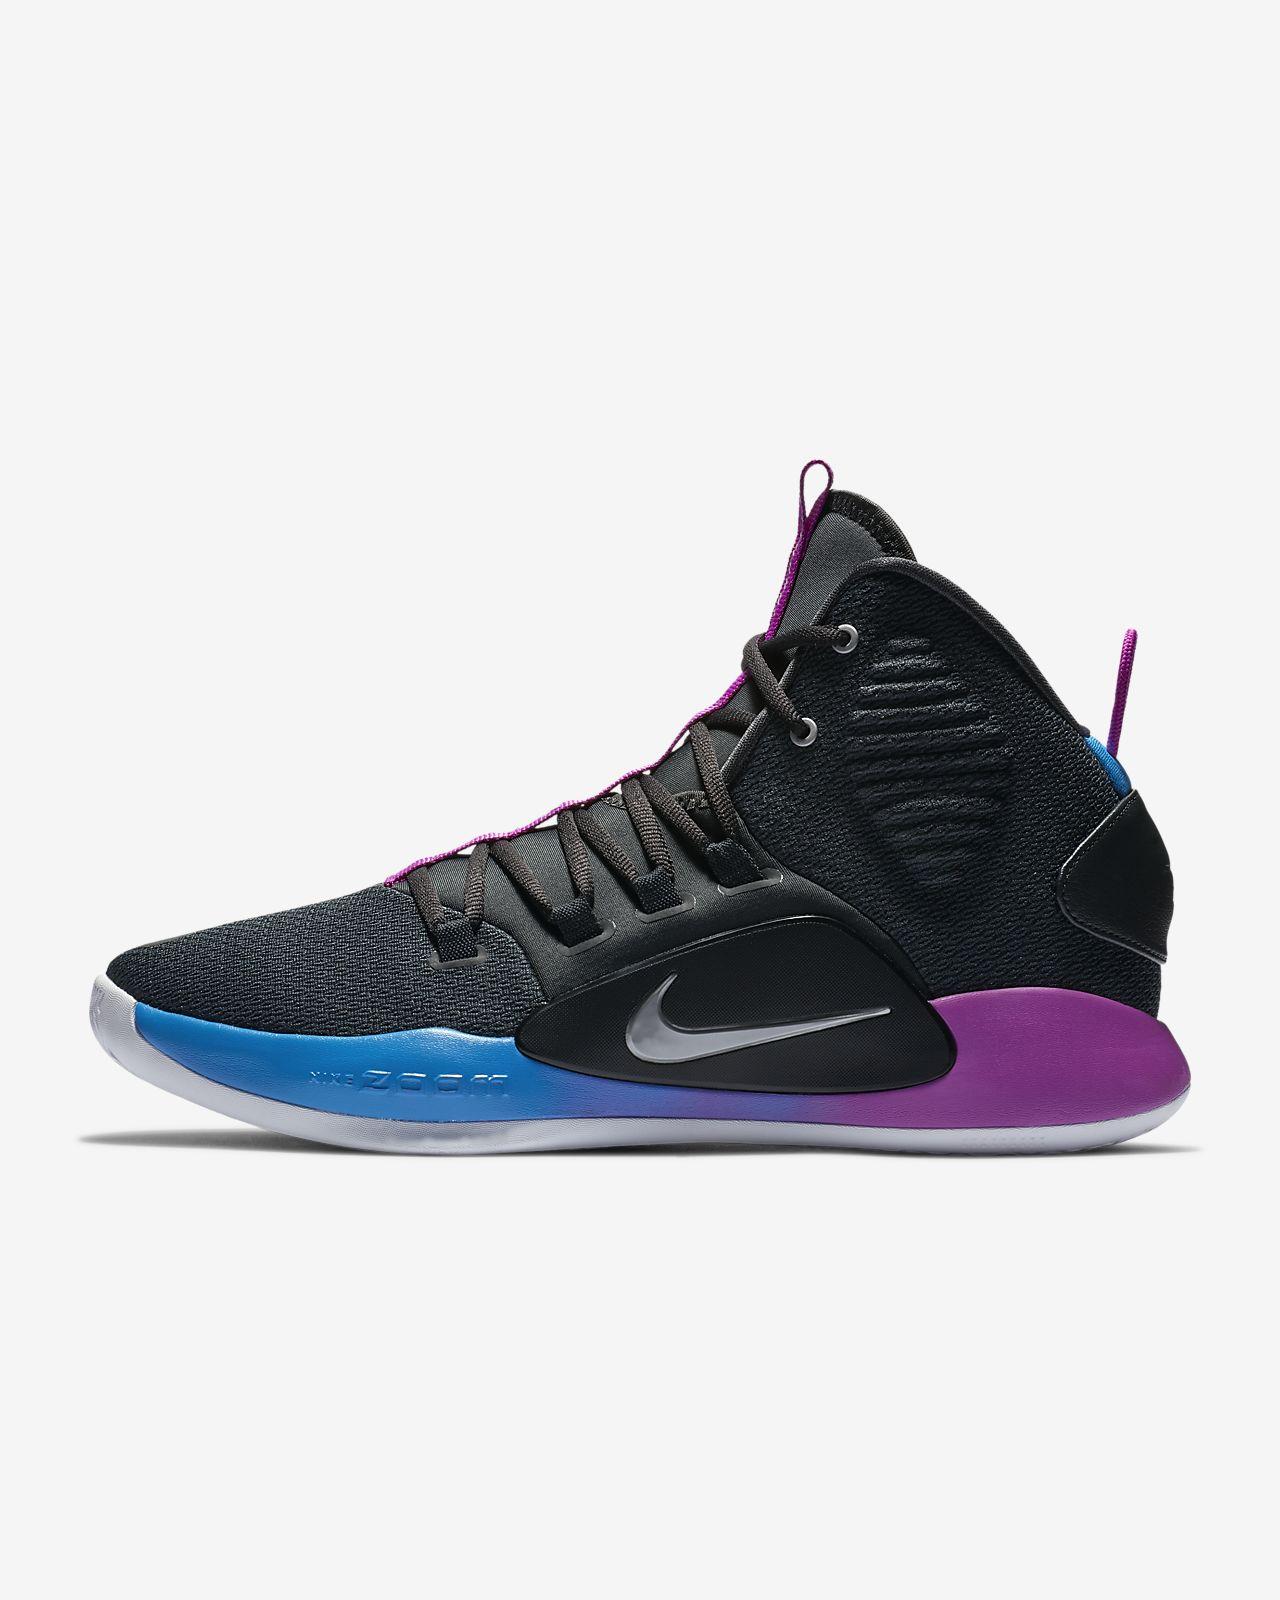 Chaussure Nike Basketball X Hyperdunk Ca De E1rwqfxEz